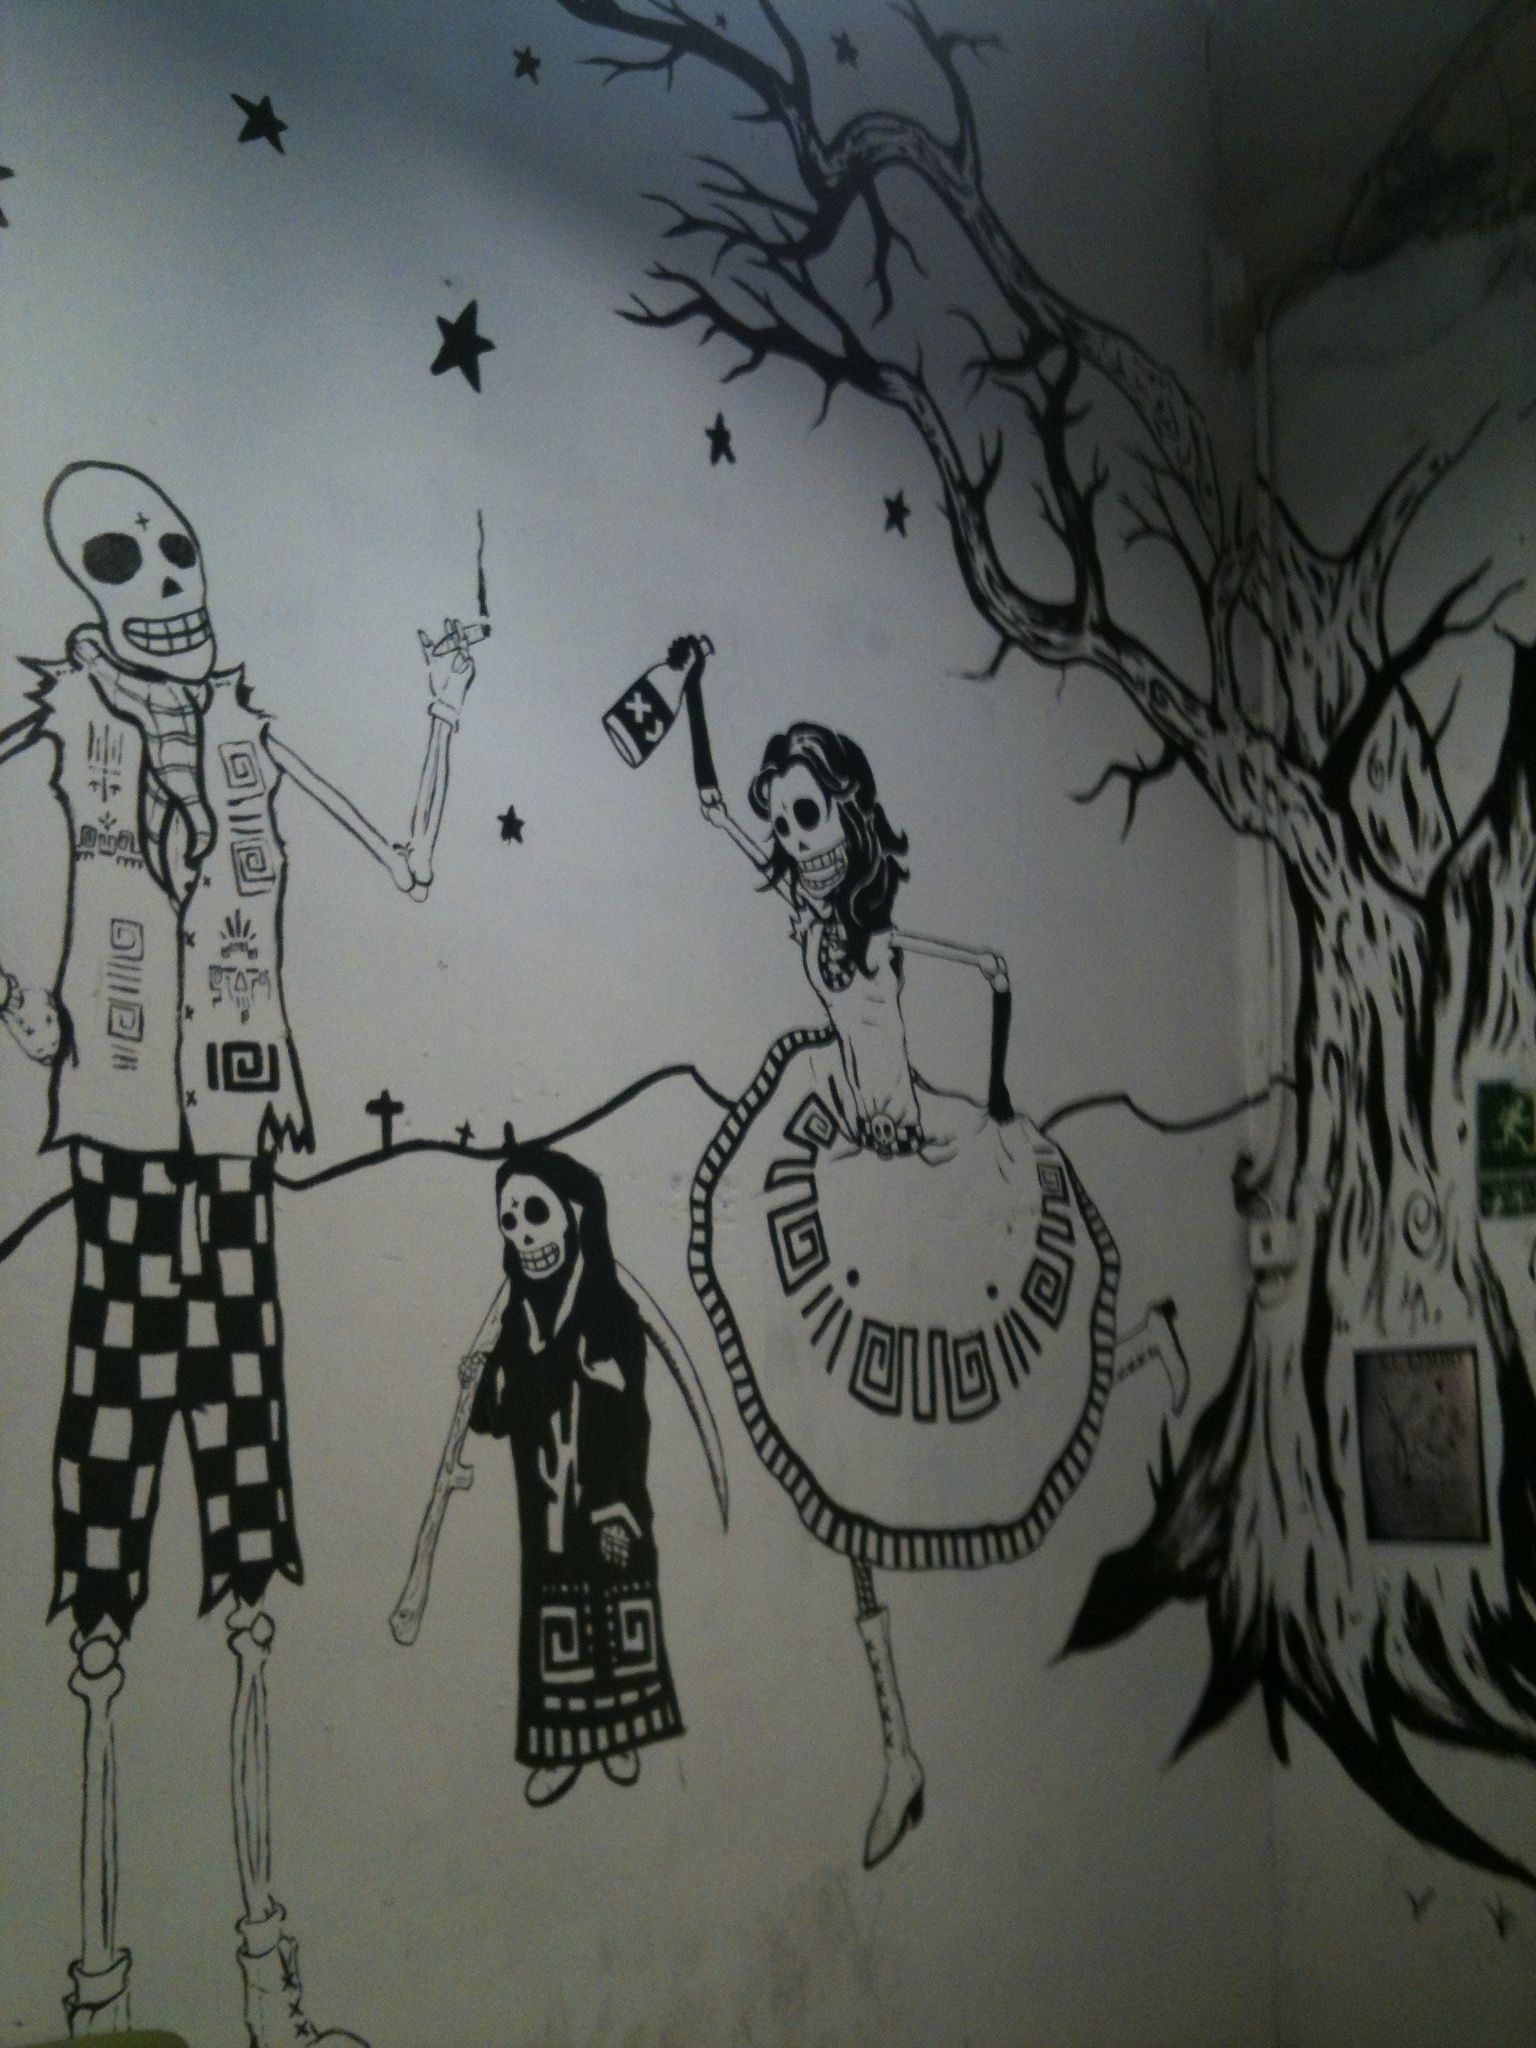 Dibujo en la pared. La Tabacalera de Lavapiés. Madrid. Enero 2012.